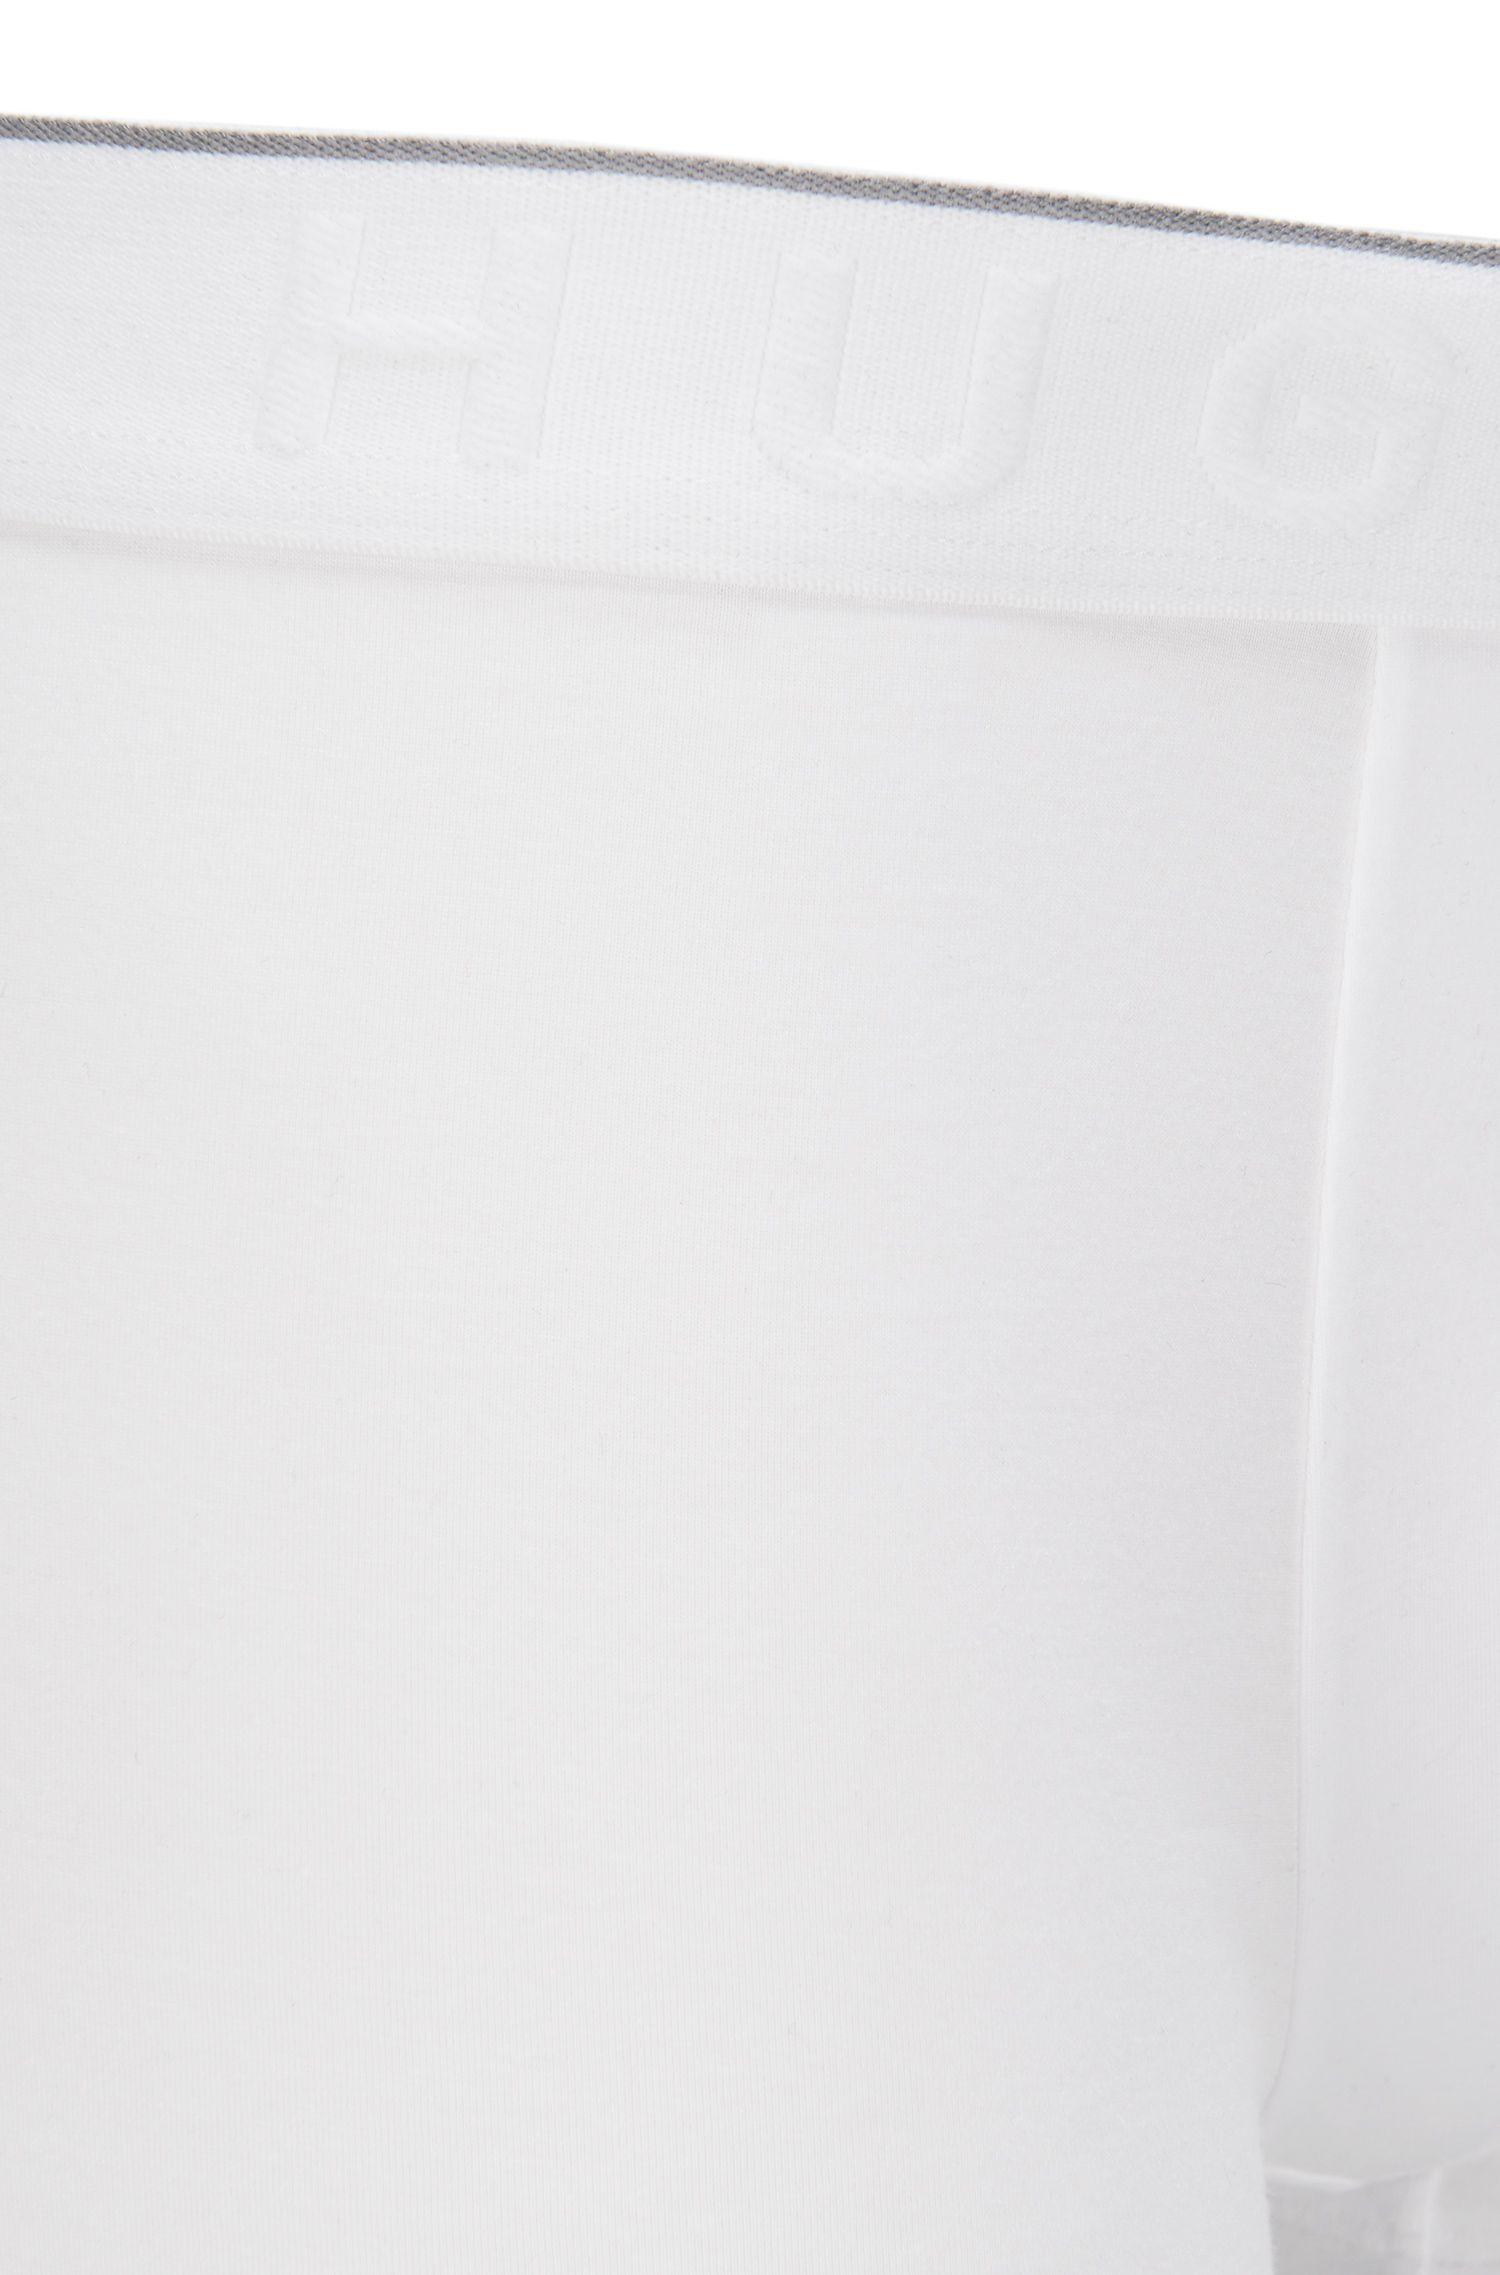 Travel Line Boxershorts aus elastischem Modal-Mix mit Lyocell: 'Trunk Seacell'